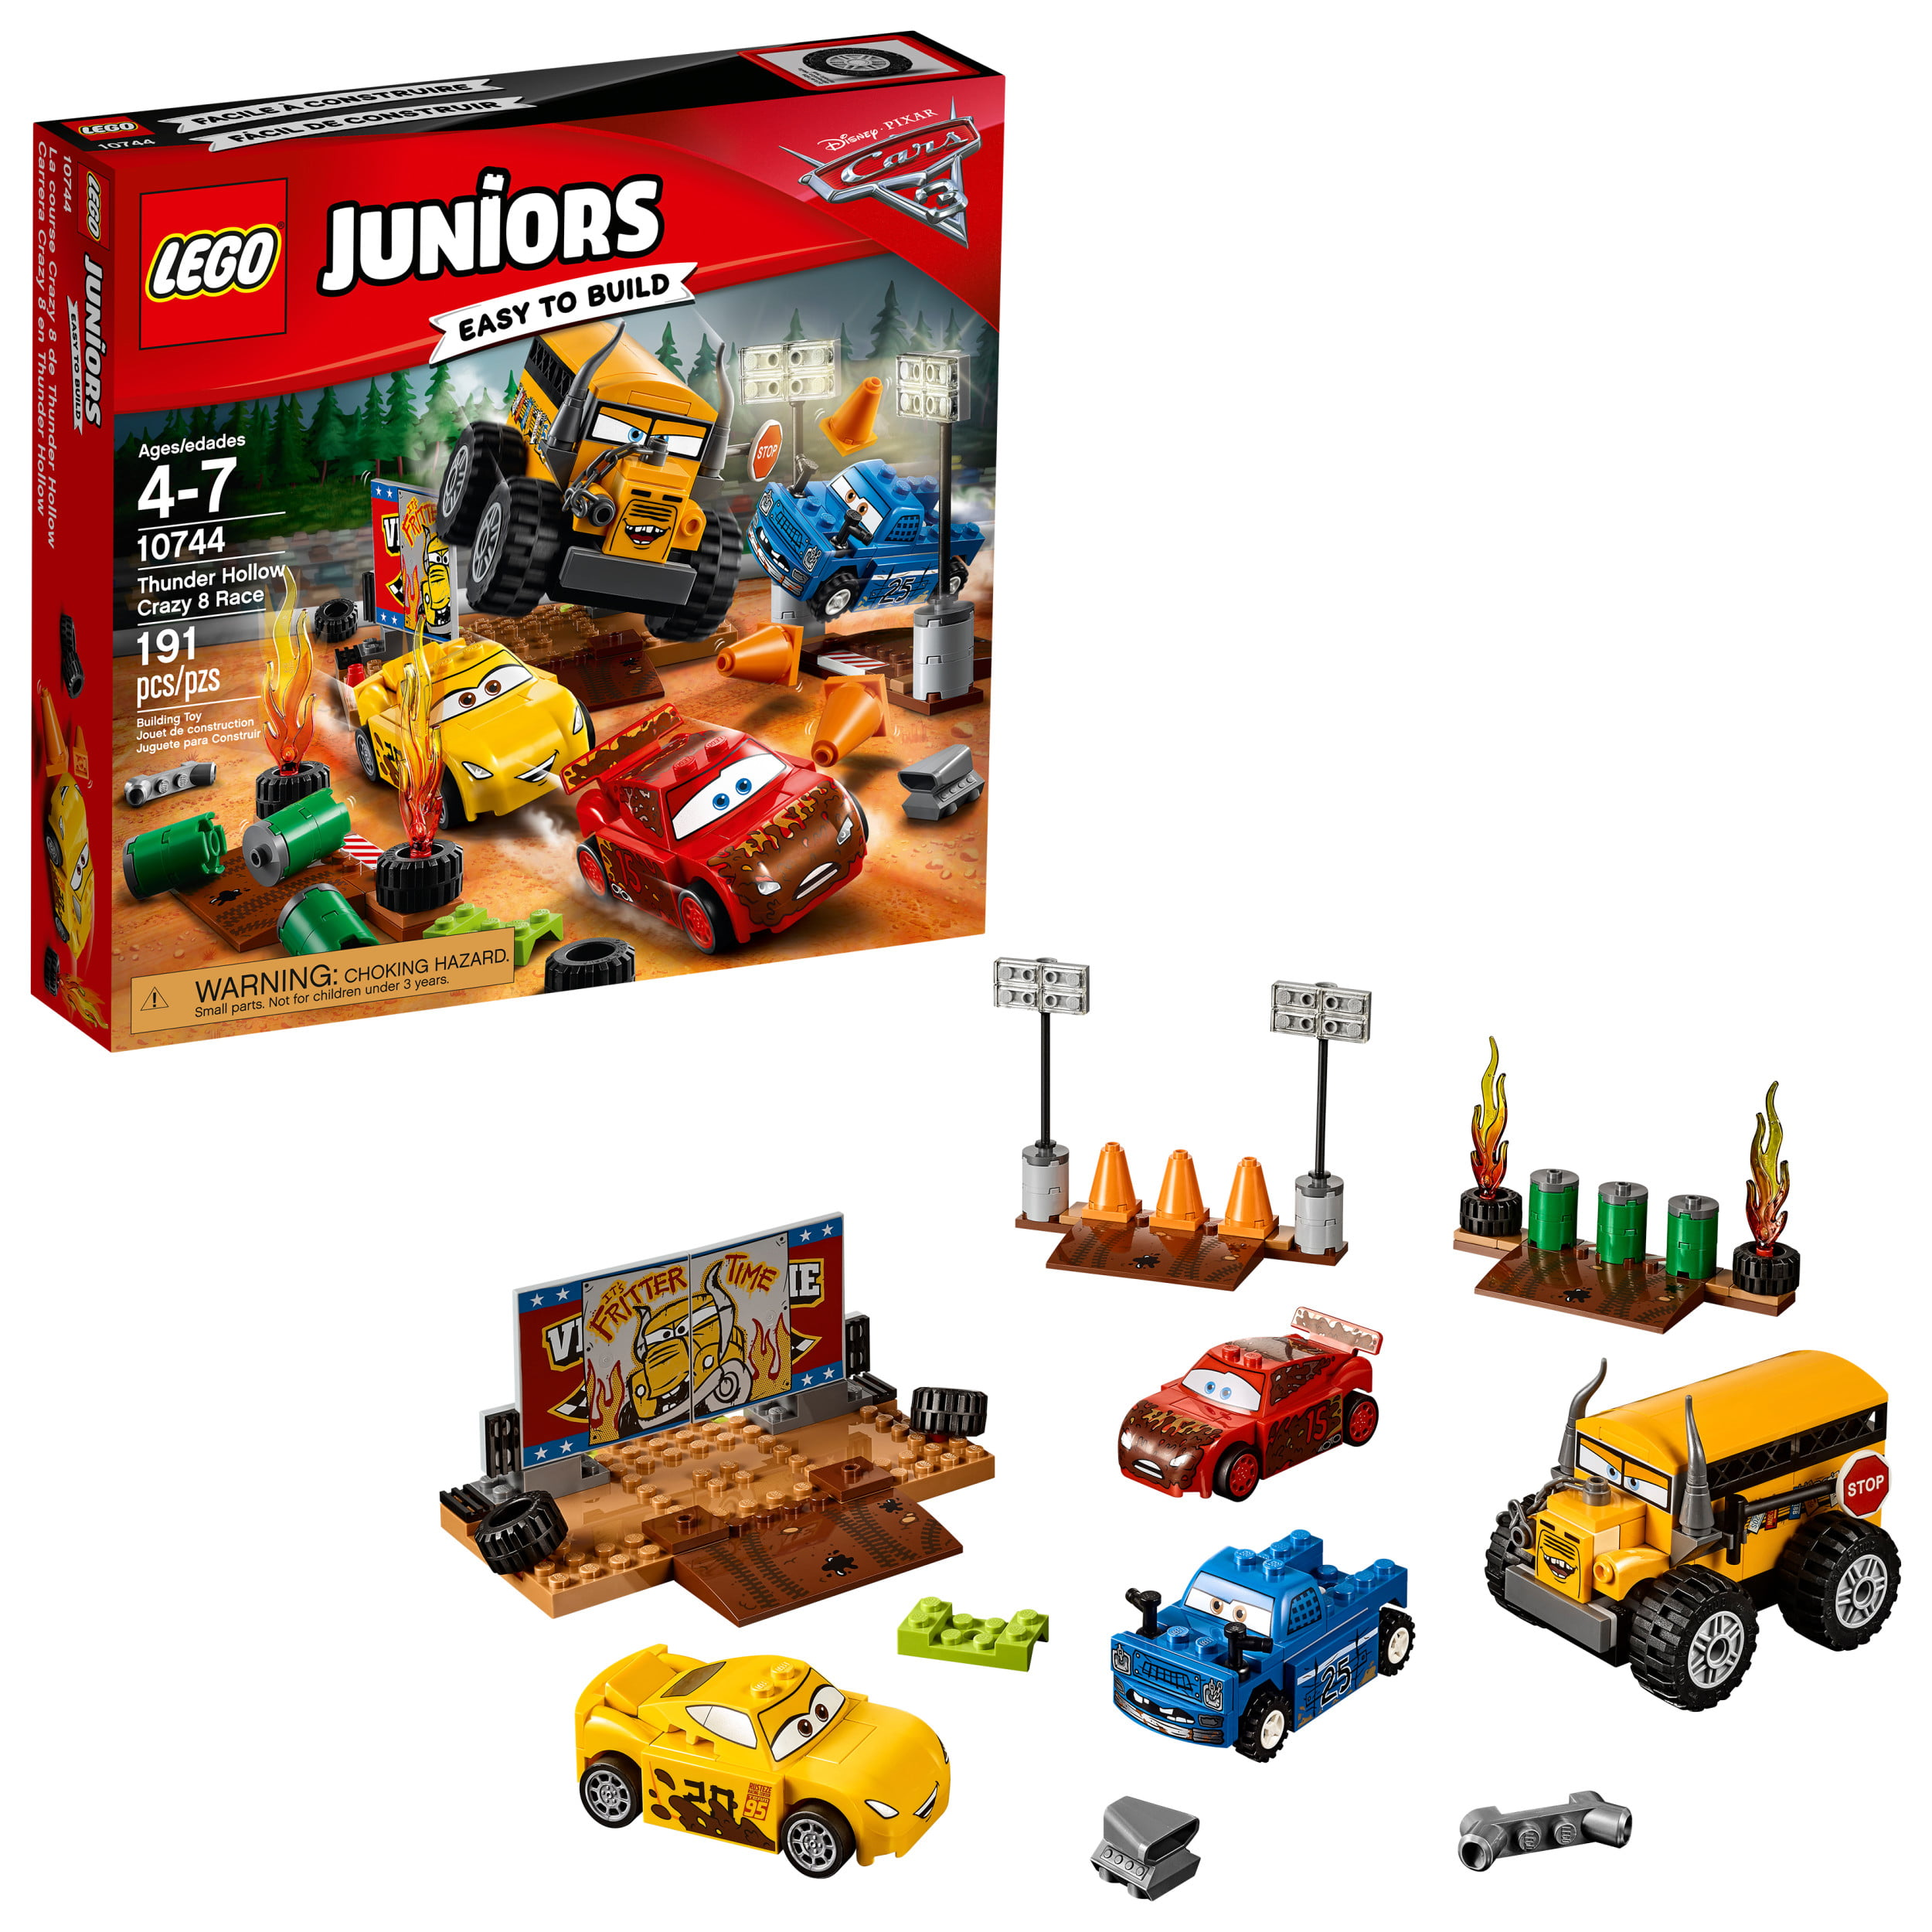 10744191 8 Pieces Lego Juniors Hollow Thunder Crazy Race rCthsdxQB